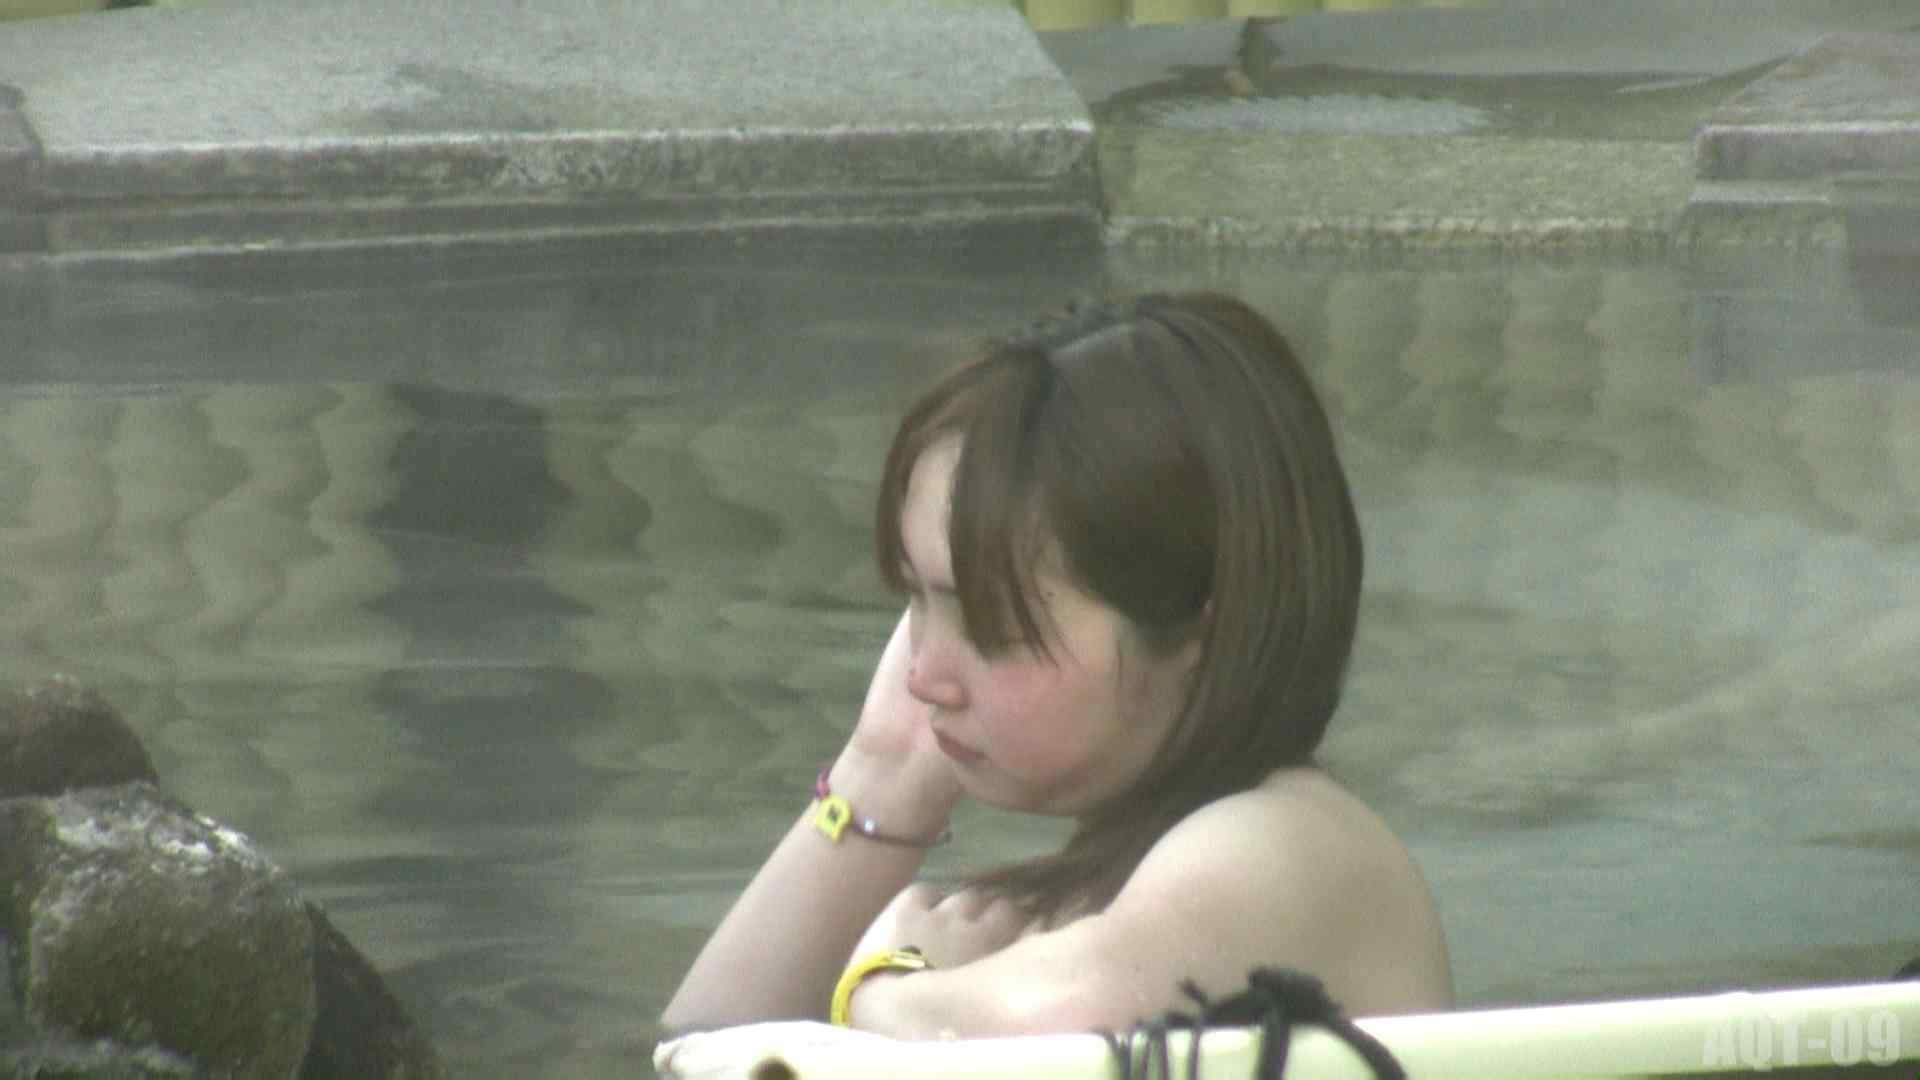 Aquaな露天風呂Vol.781 OLセックス 盗撮動画紹介 110画像 56